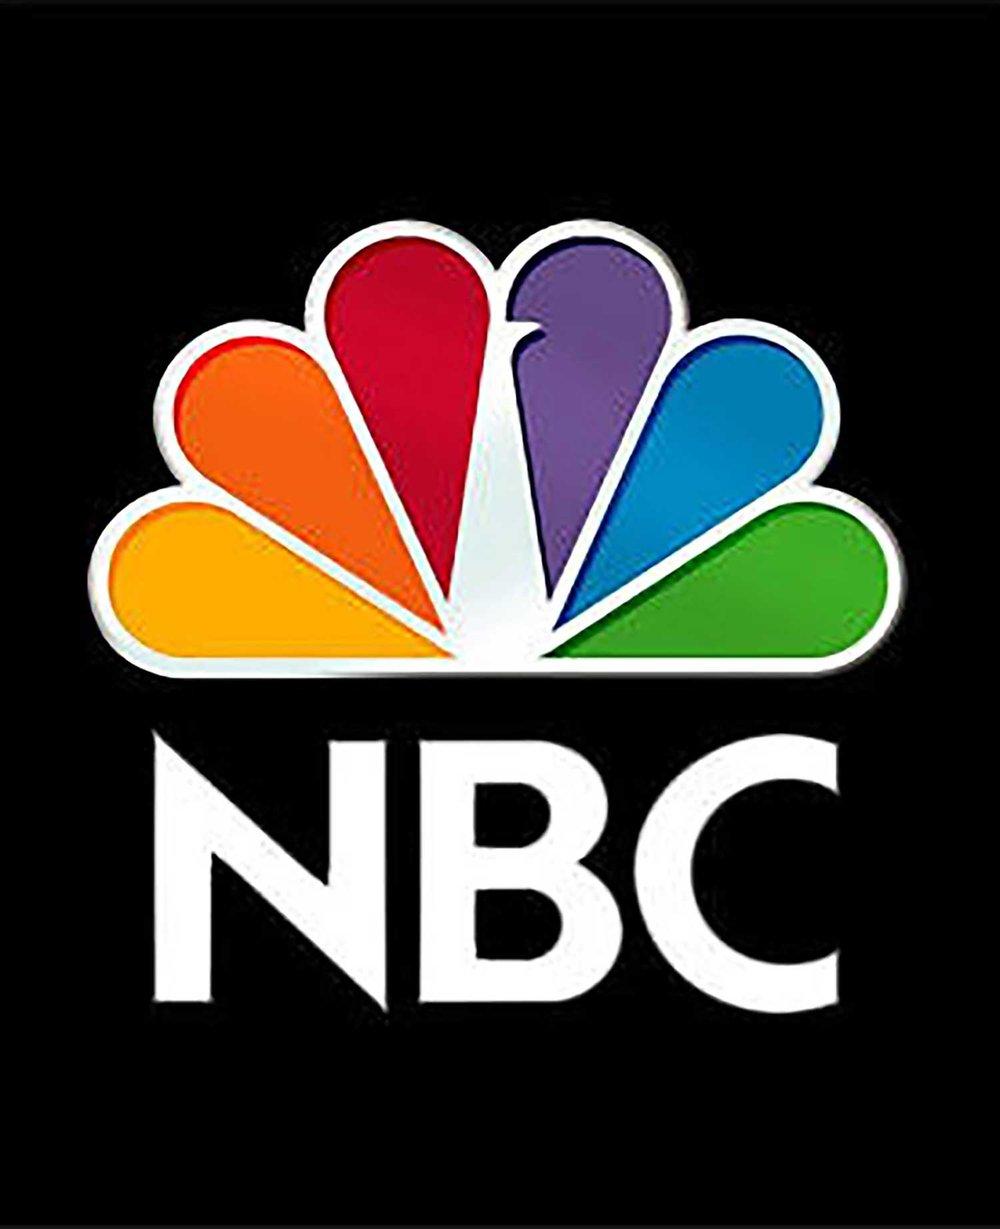 NBC.com: America's 15 Best Wedding Bands -